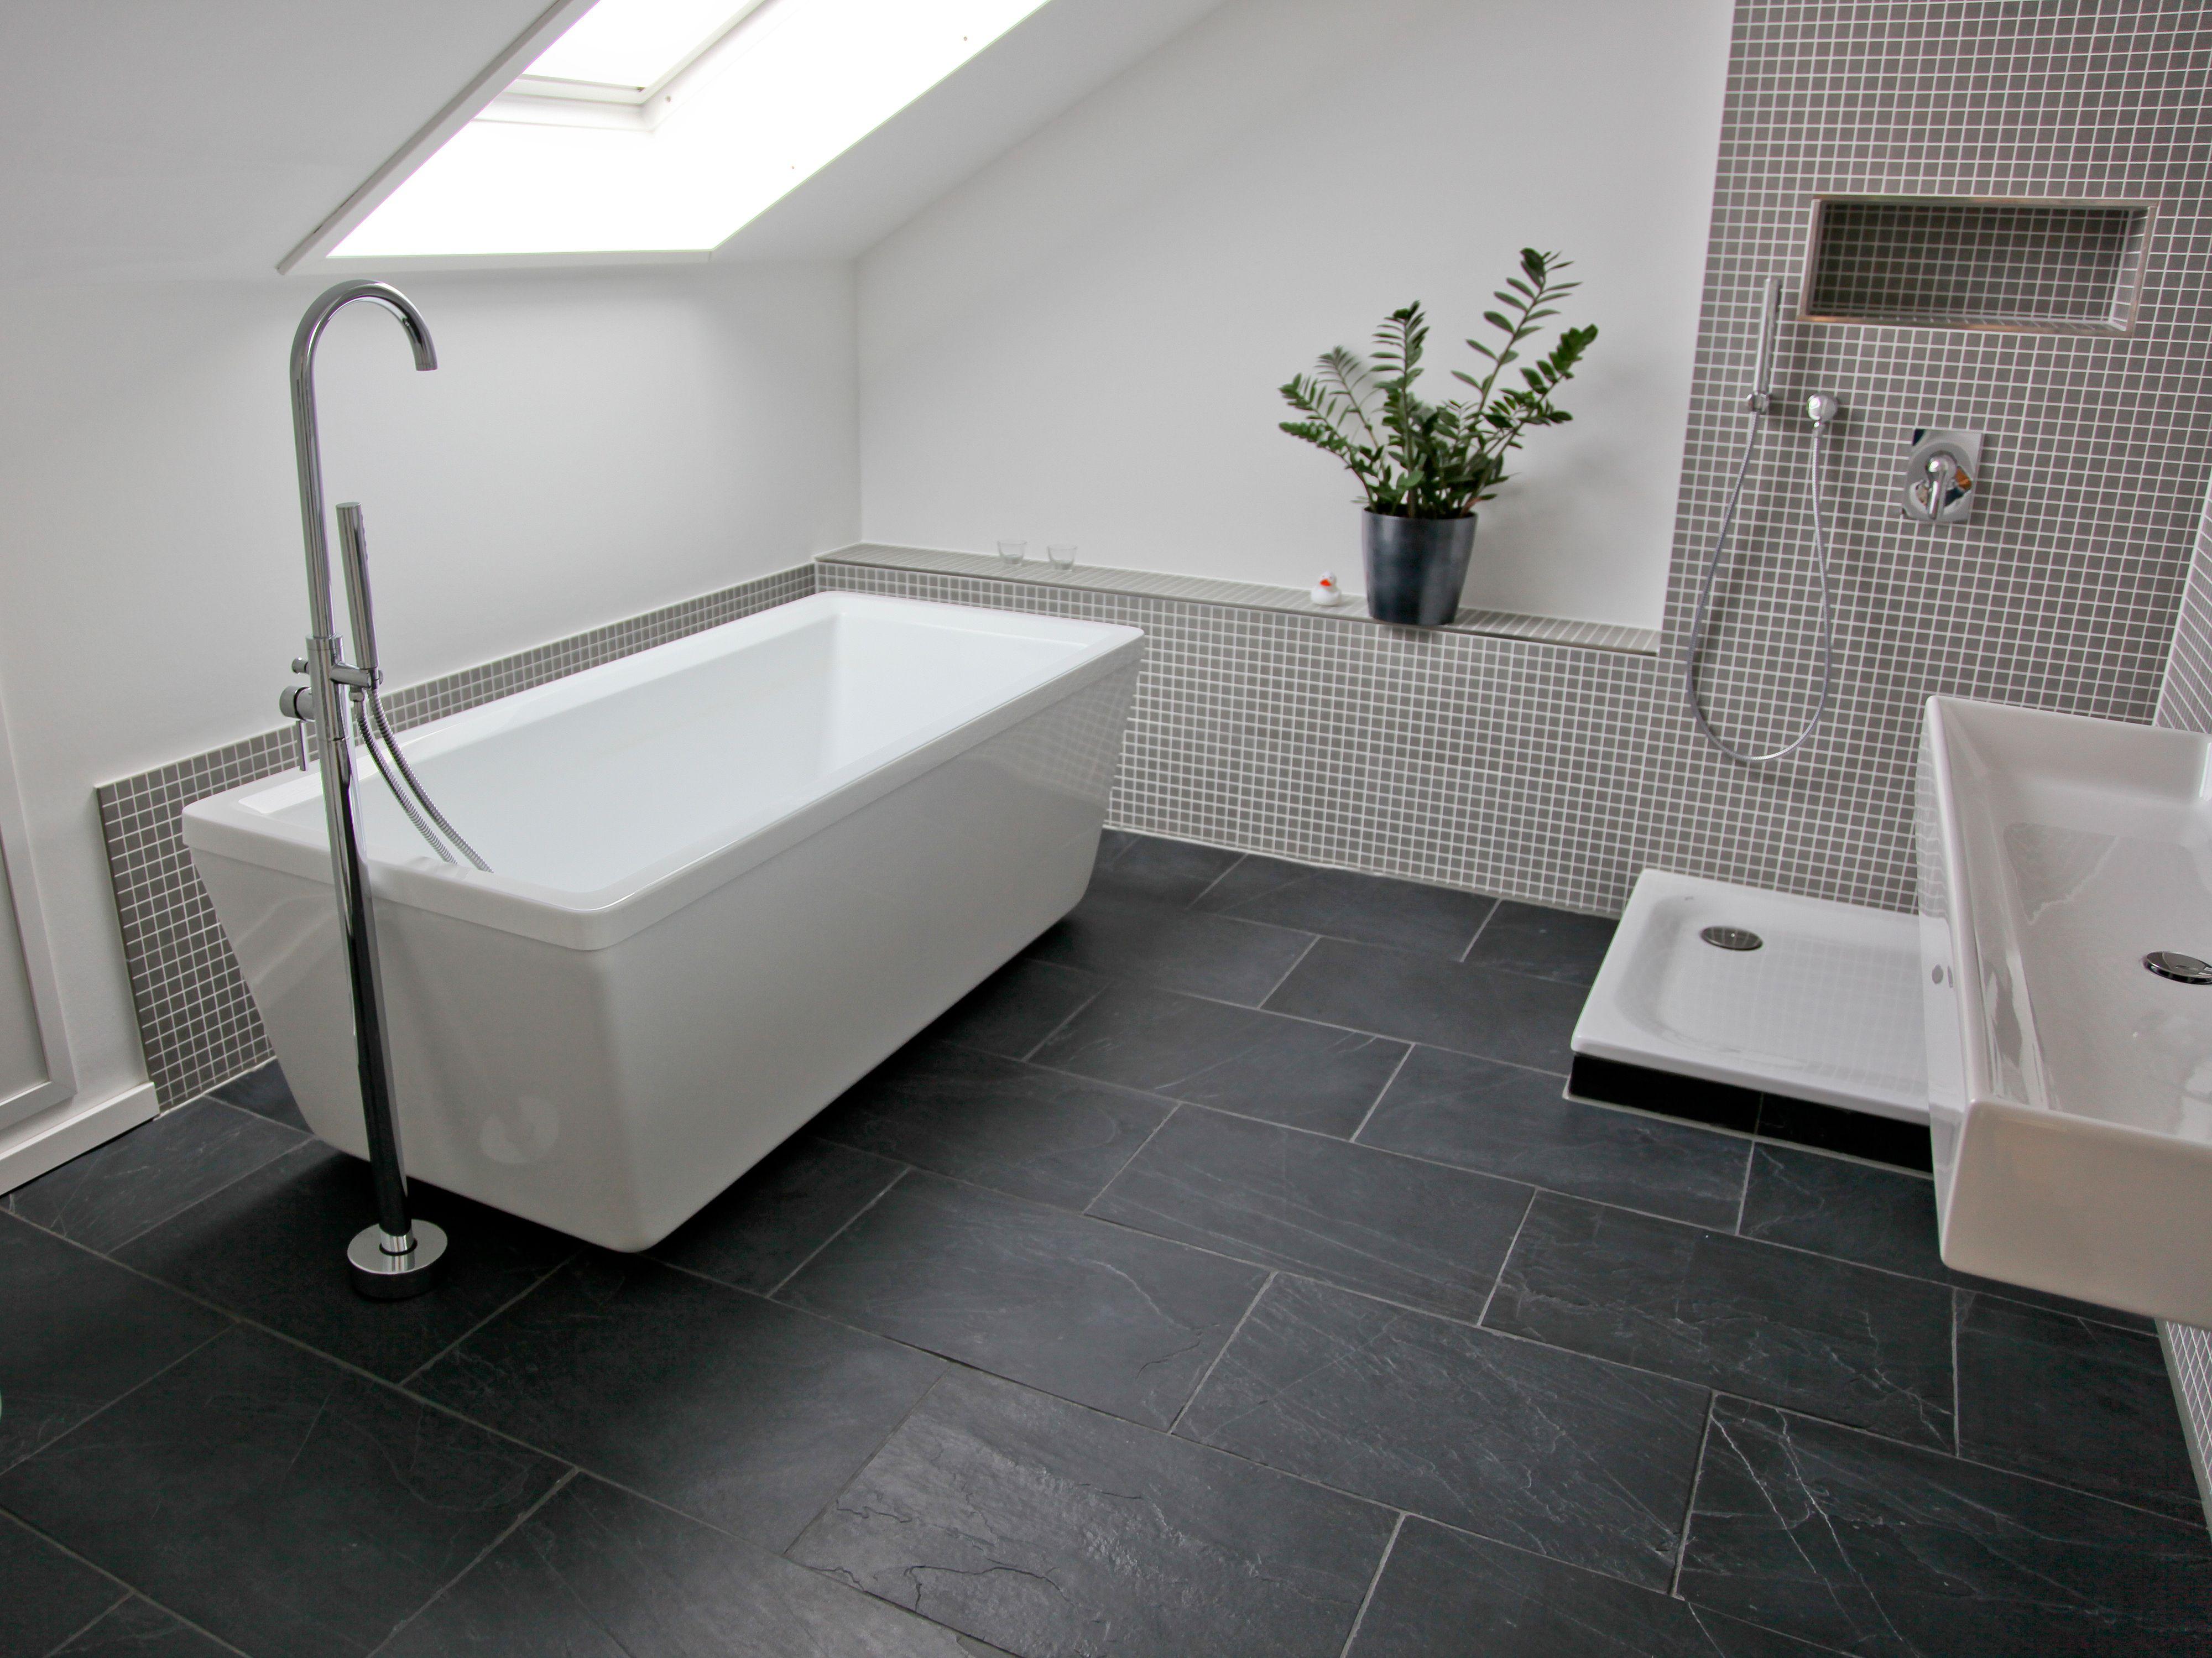 Schiefer Fliesen Black Rustic Schiefer Badezimmer Badezimmer Dachschrage Badezimmer Fliesen